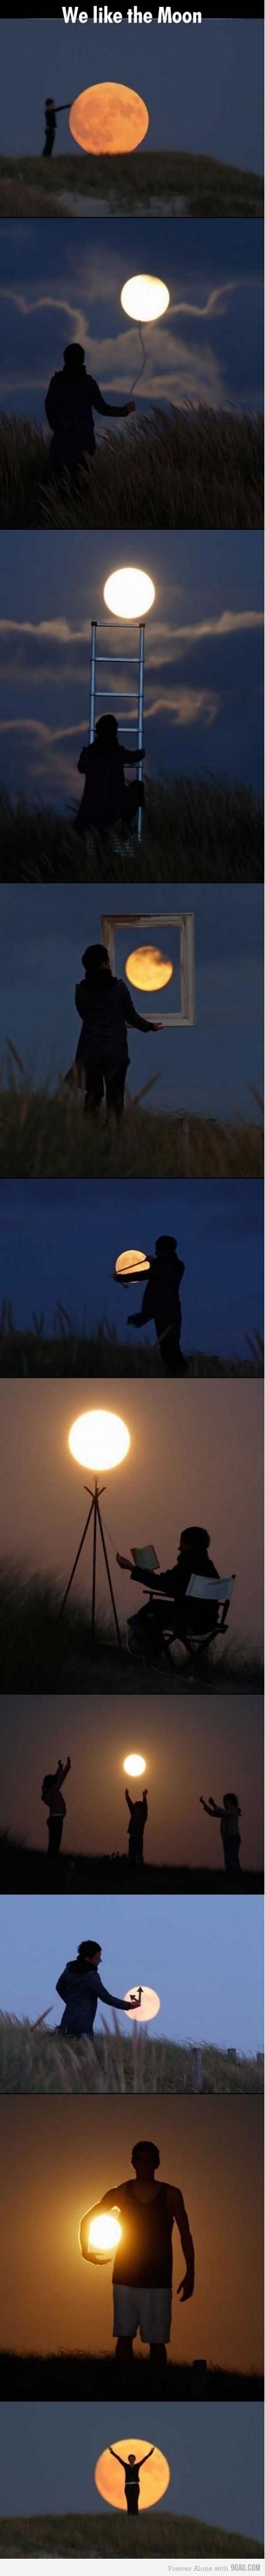 Mastering the Moon: Laurent Lavendar